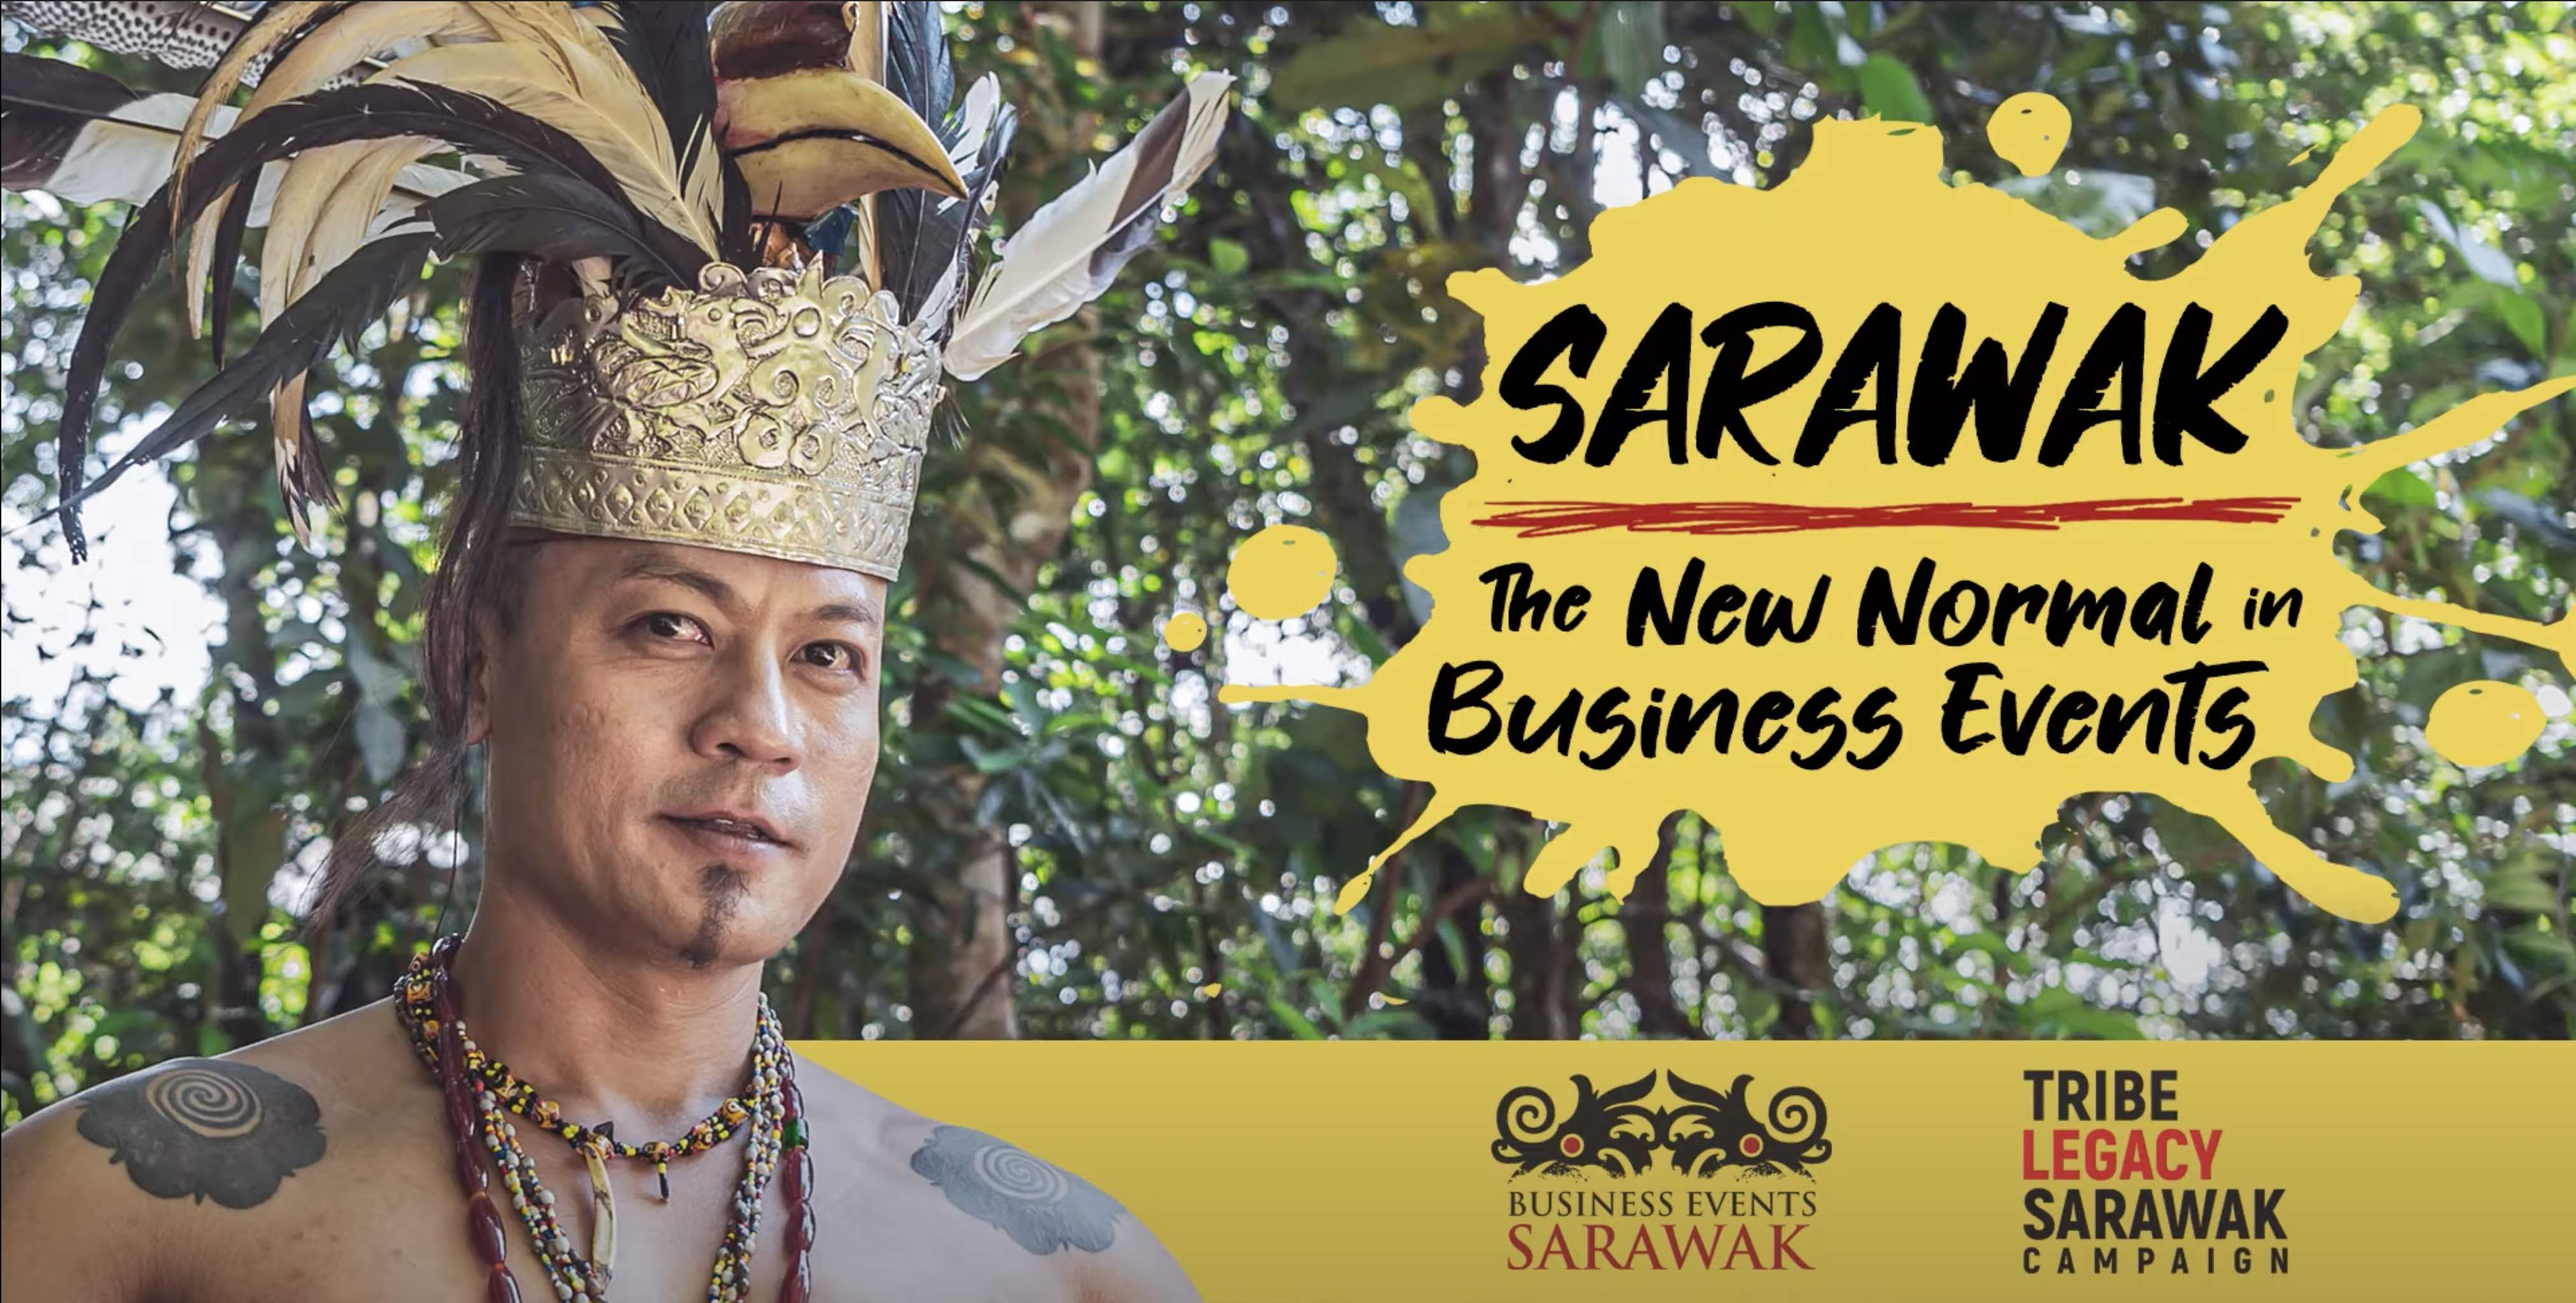 Business Events Sarawak bags L.A. film award